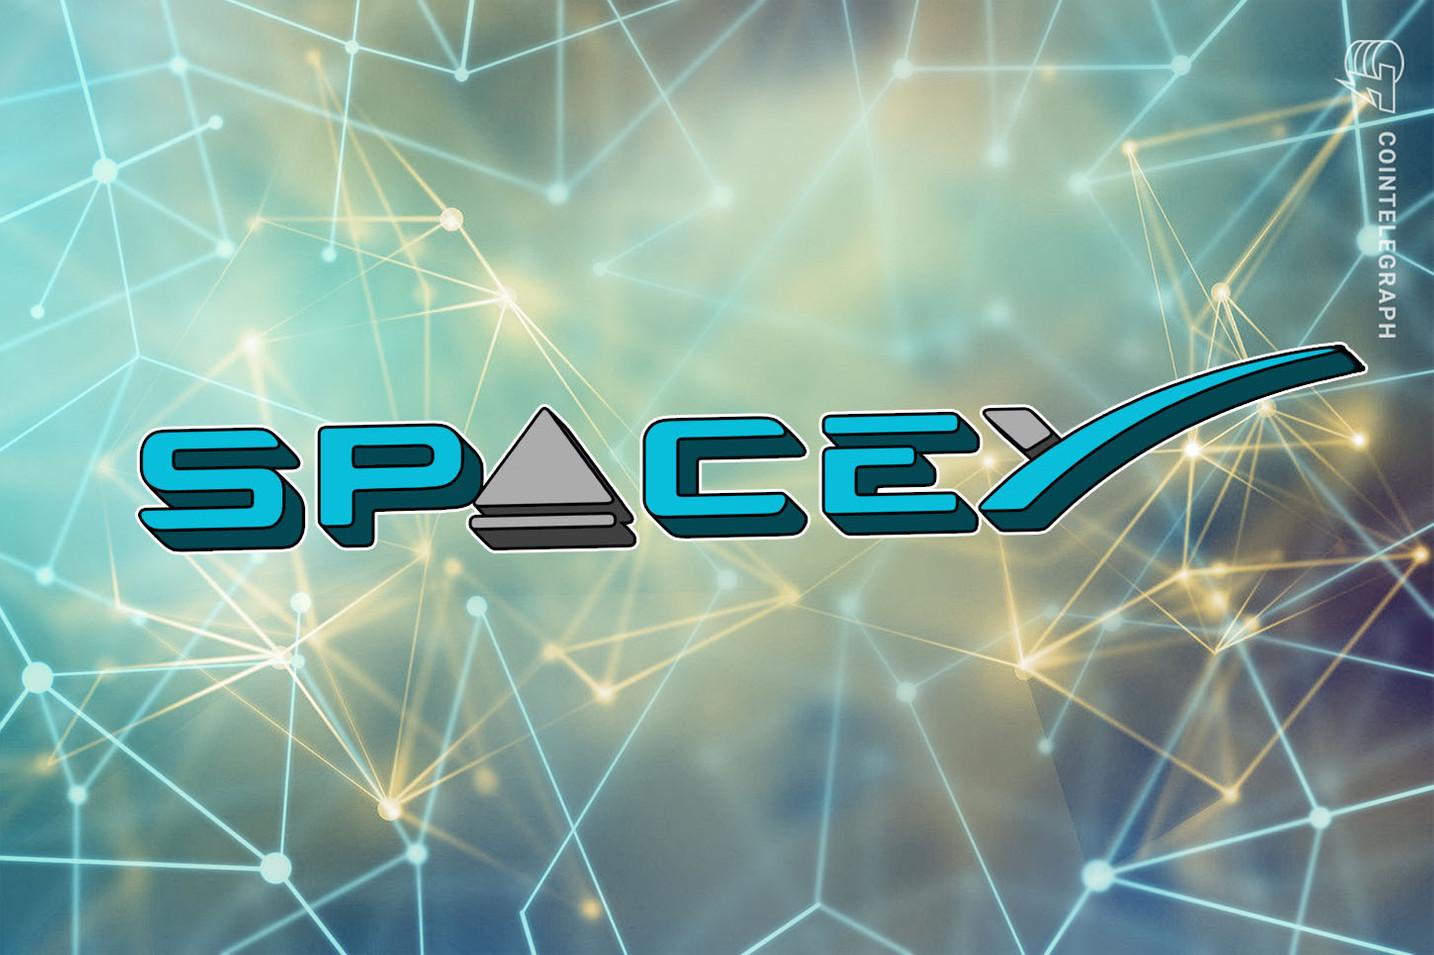 SpaceY 2025 metaverse v1 is online